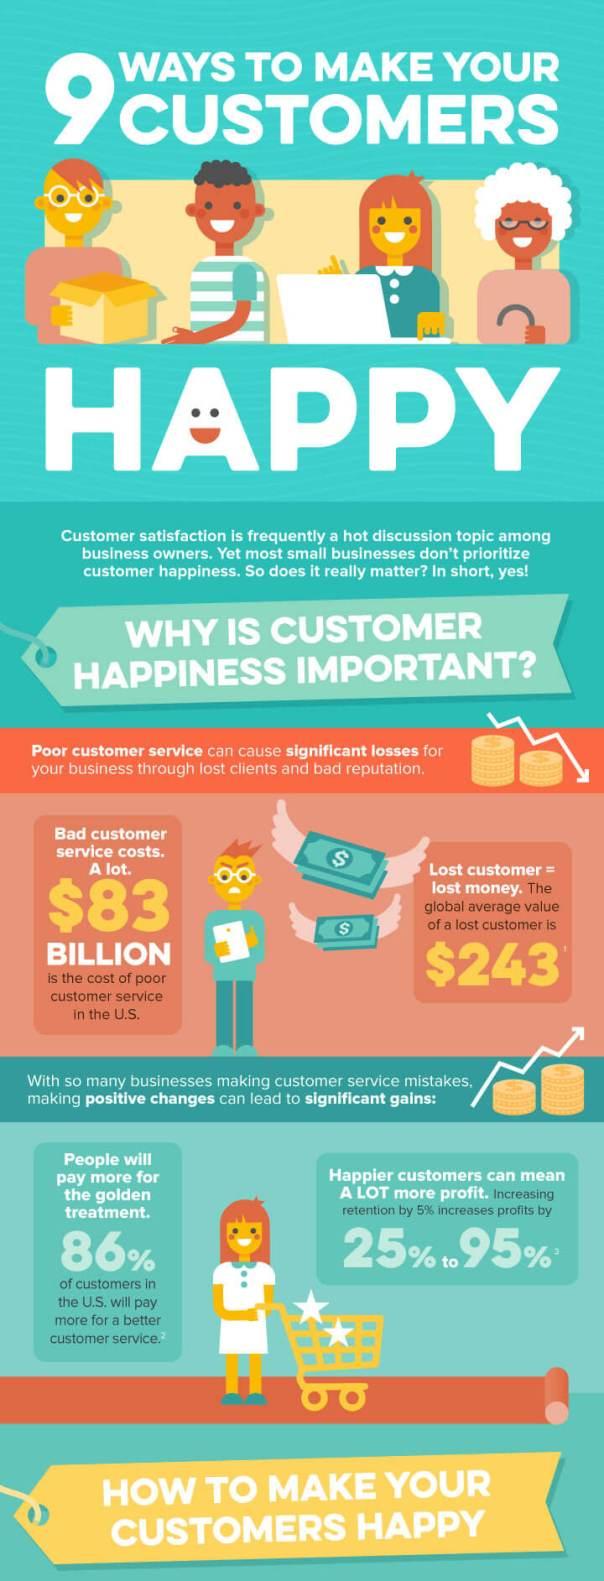 customer service tips Archives - Tabsite Blog